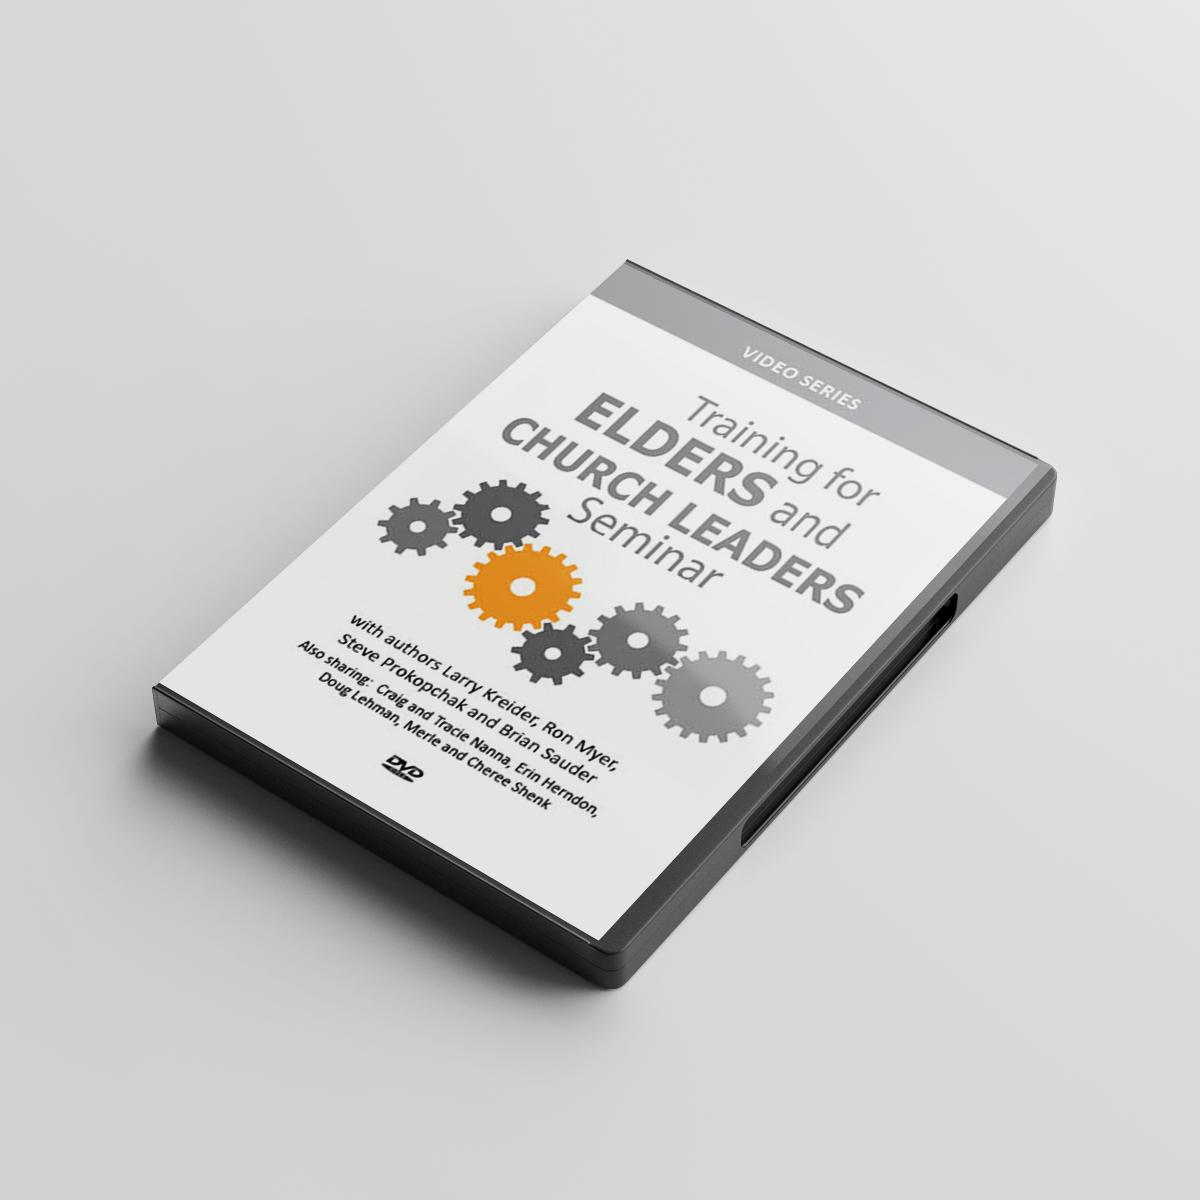 Training for Elders and Leadership DVD